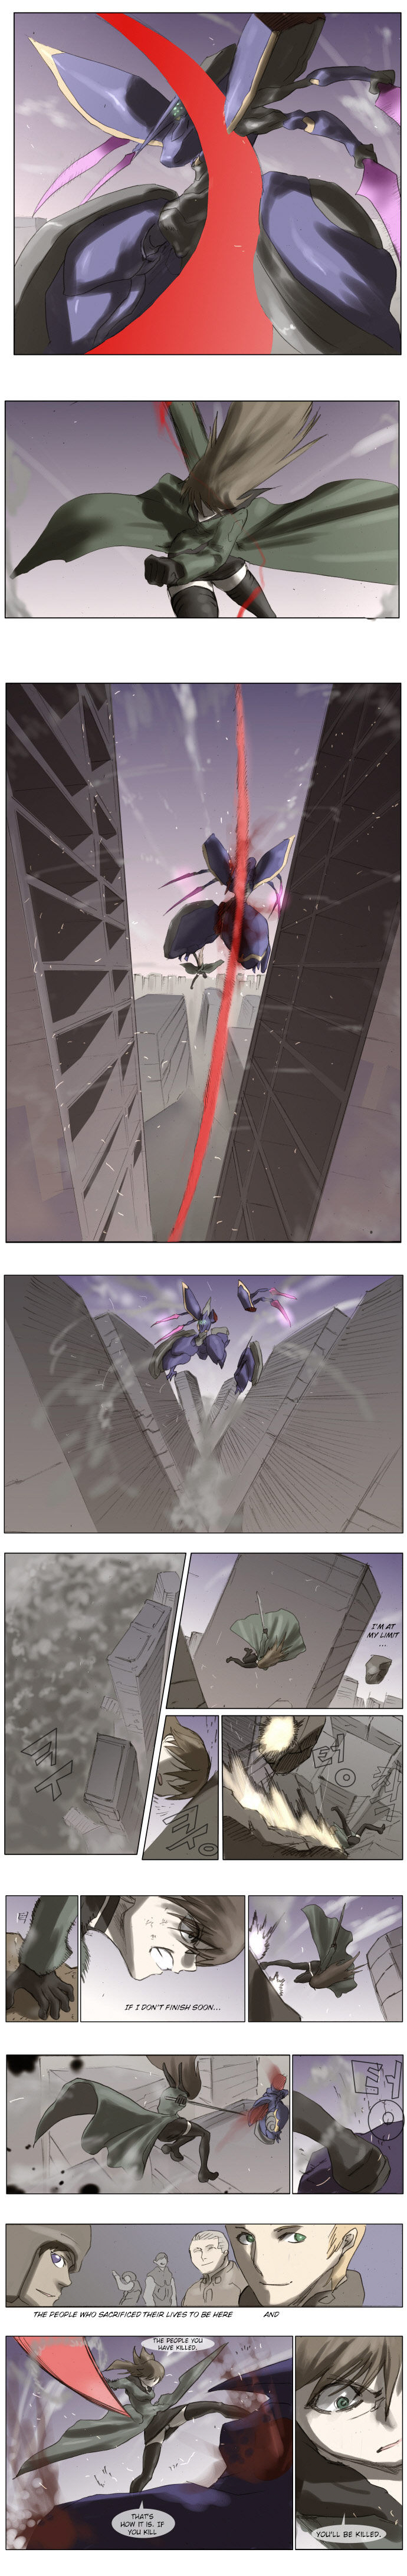 Knight Run 59 Page 2